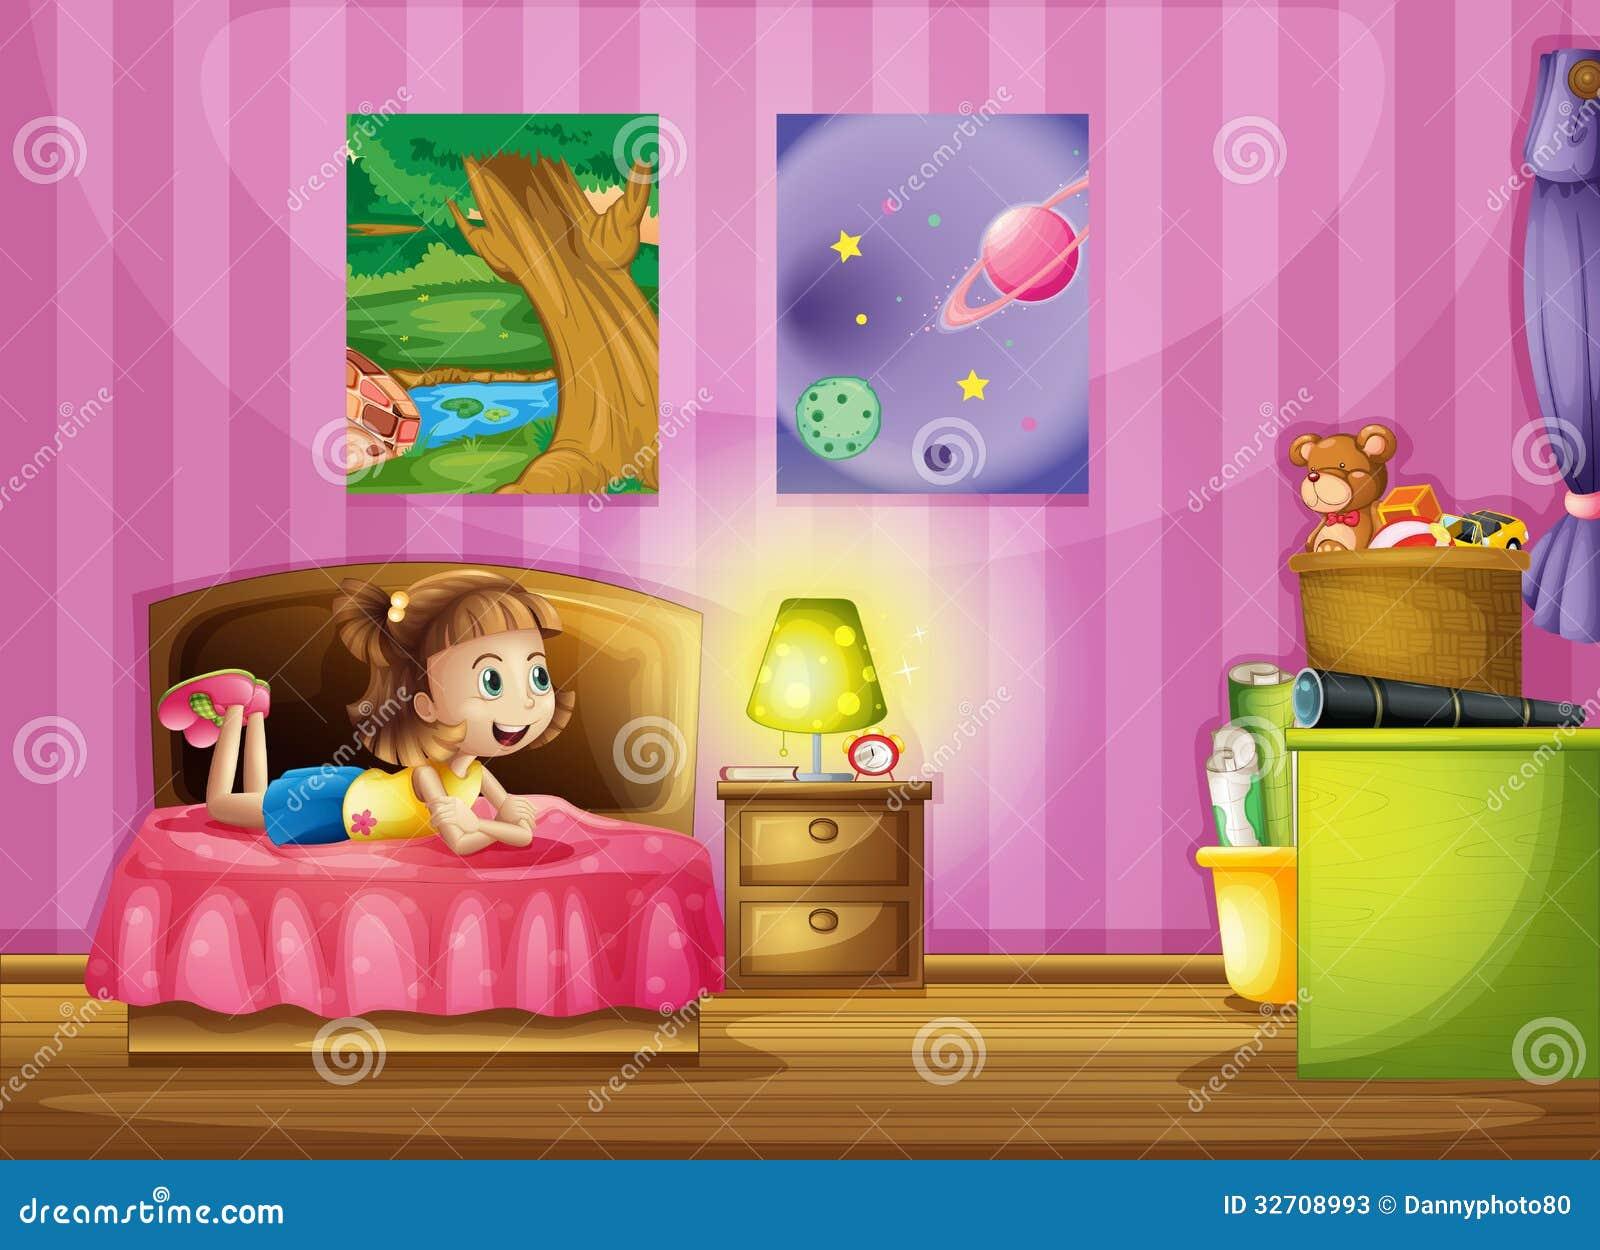 Een klein meisje binnen haar kleurrijke ruimte stock foto 39 s beeld 32708993 - Foto slaapkamer klein meisje ...